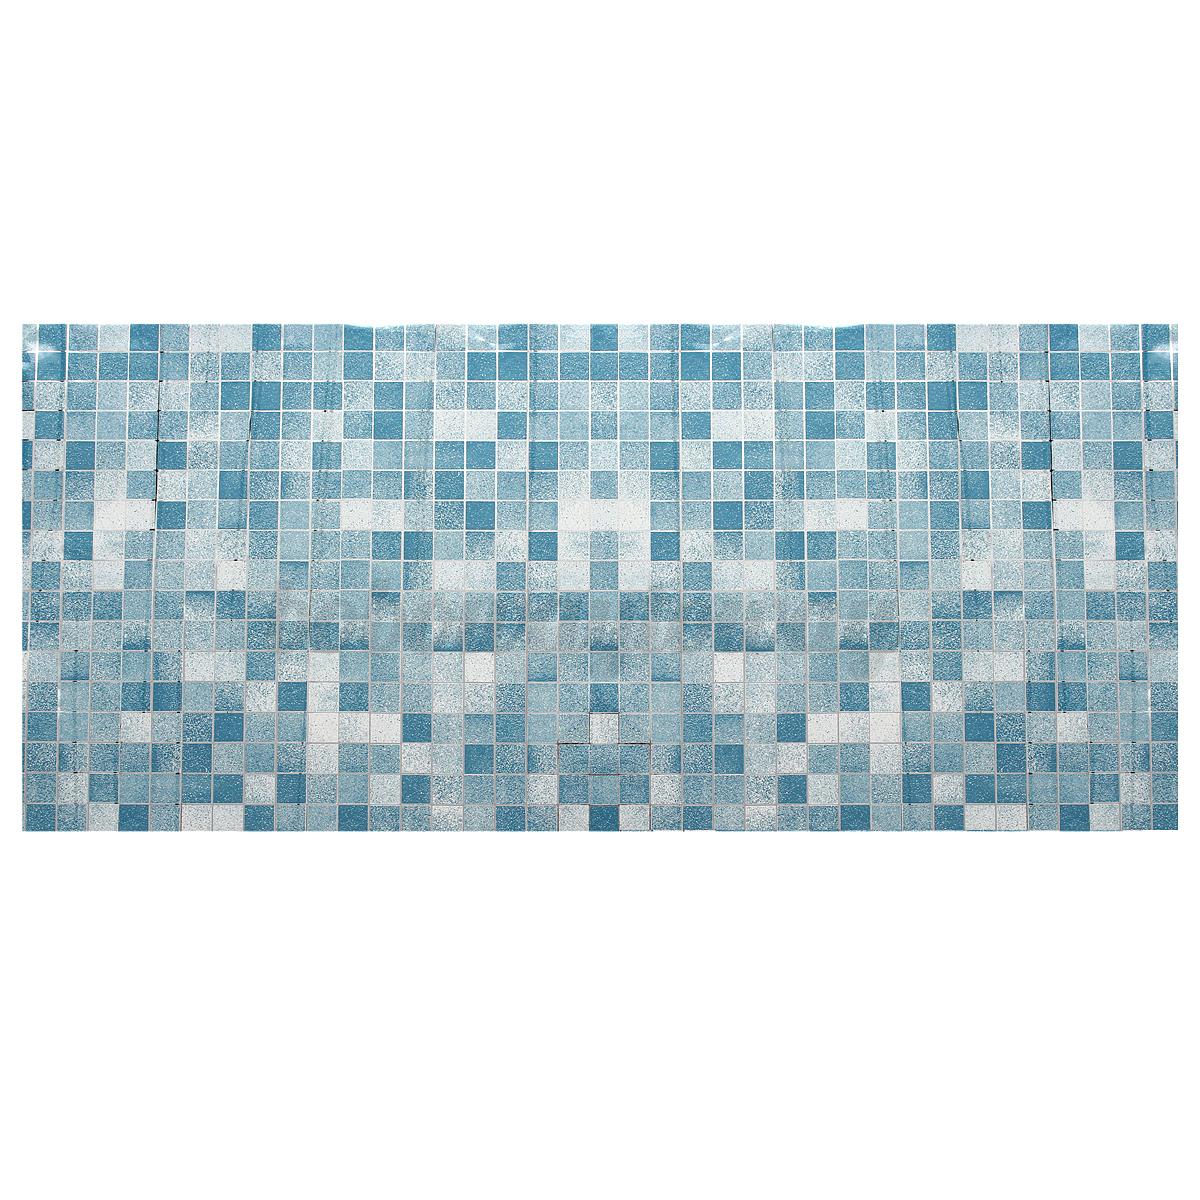 45x100cm mosaik tapete wand fliese anti l aufkleber for Mosaik aufkleber